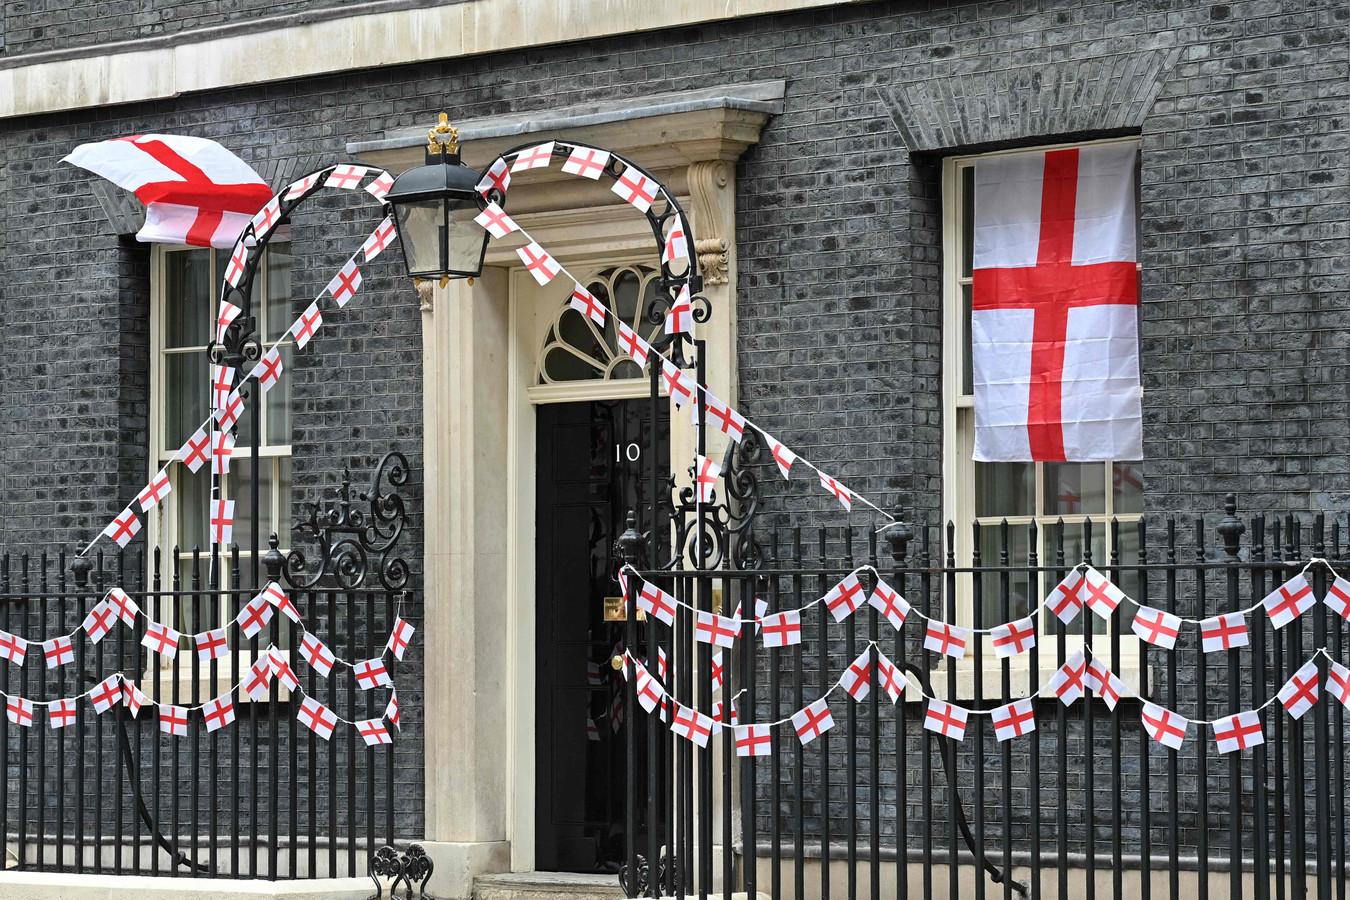 Downing Street 10.